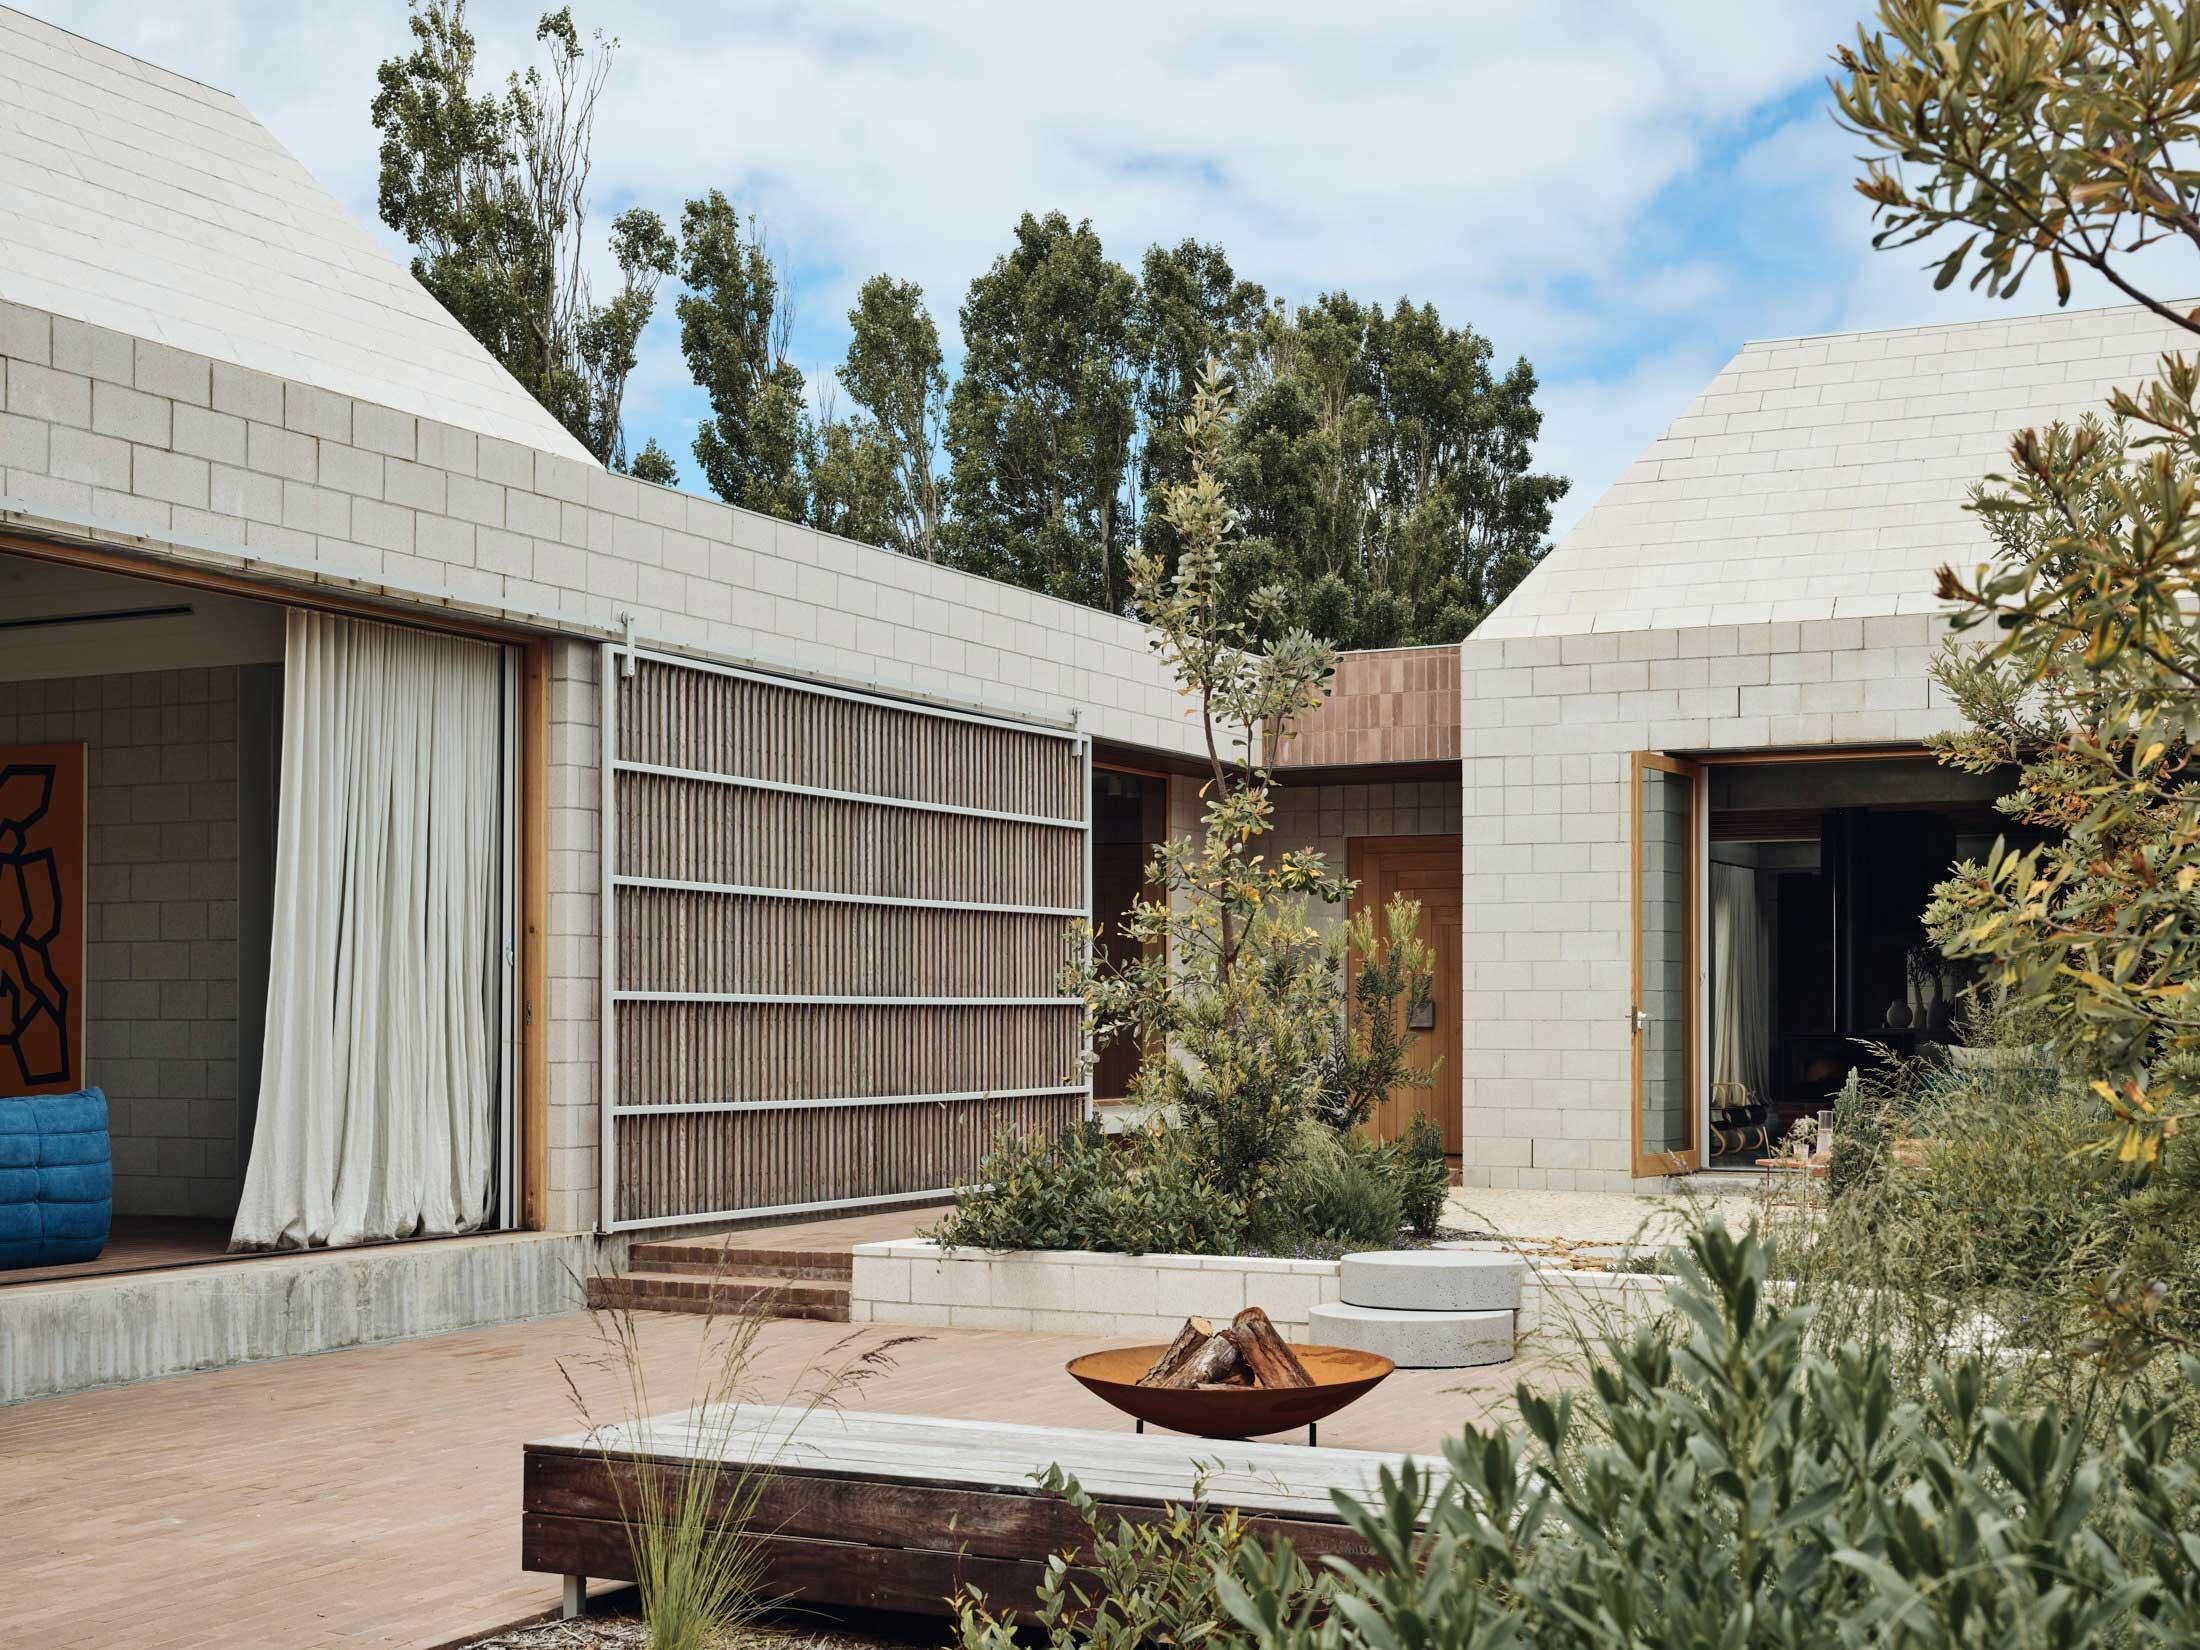 Architects Eat Bellows Beach House Flinders Masonry Architecture Photo Derek Swalwell Yellowtrace 13